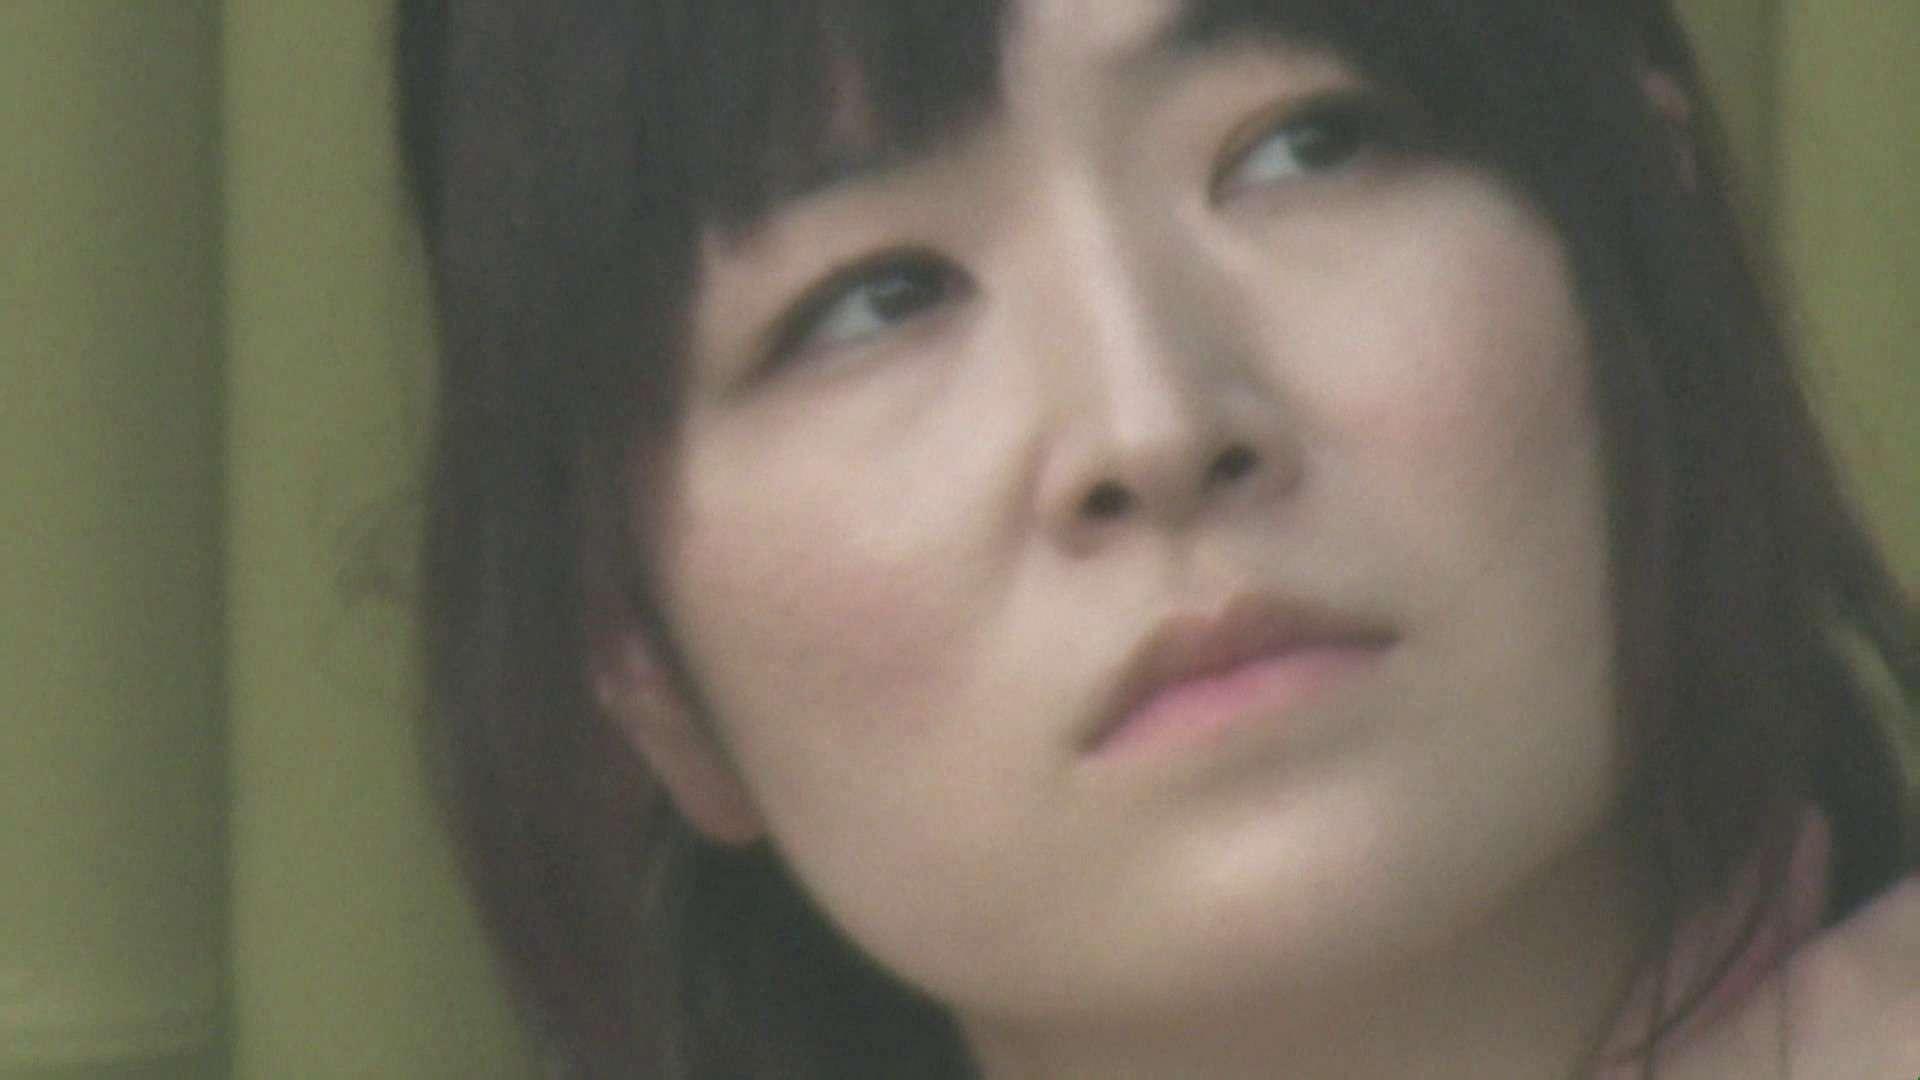 Aquaな露天風呂Vol.606 OLのエロ生活 性交動画流出 25連発 14